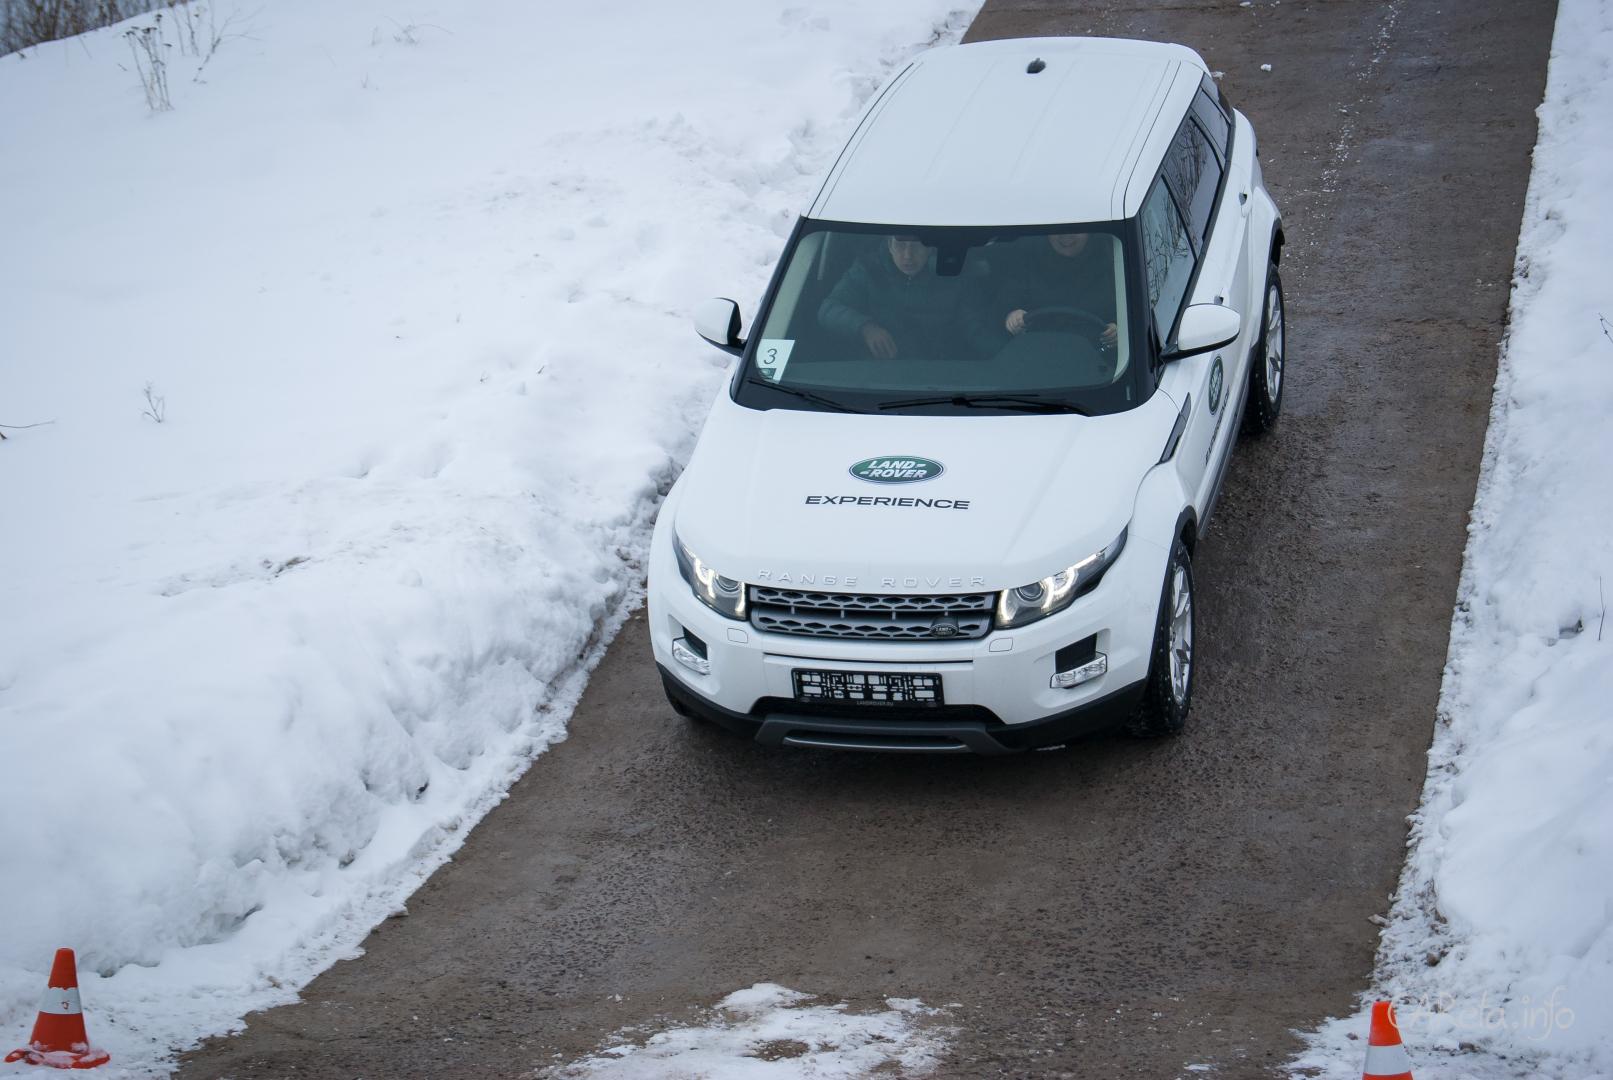 Land Rover Experience - едем не по дорогам, а в направлении!